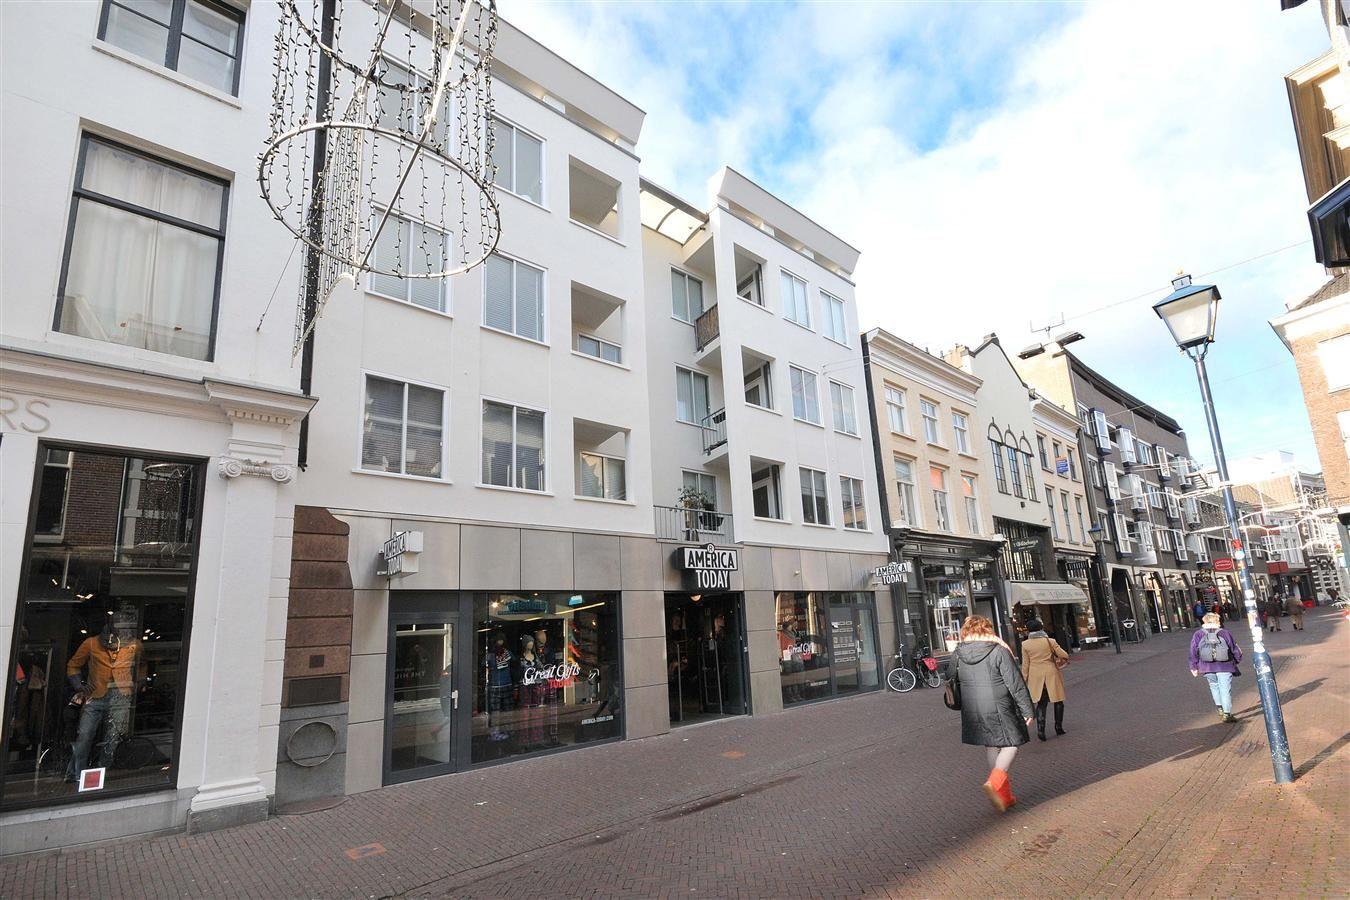 Gezellig Zonnig Balkon : In het bruisende centrum van arnhem gelegen modern appartement met